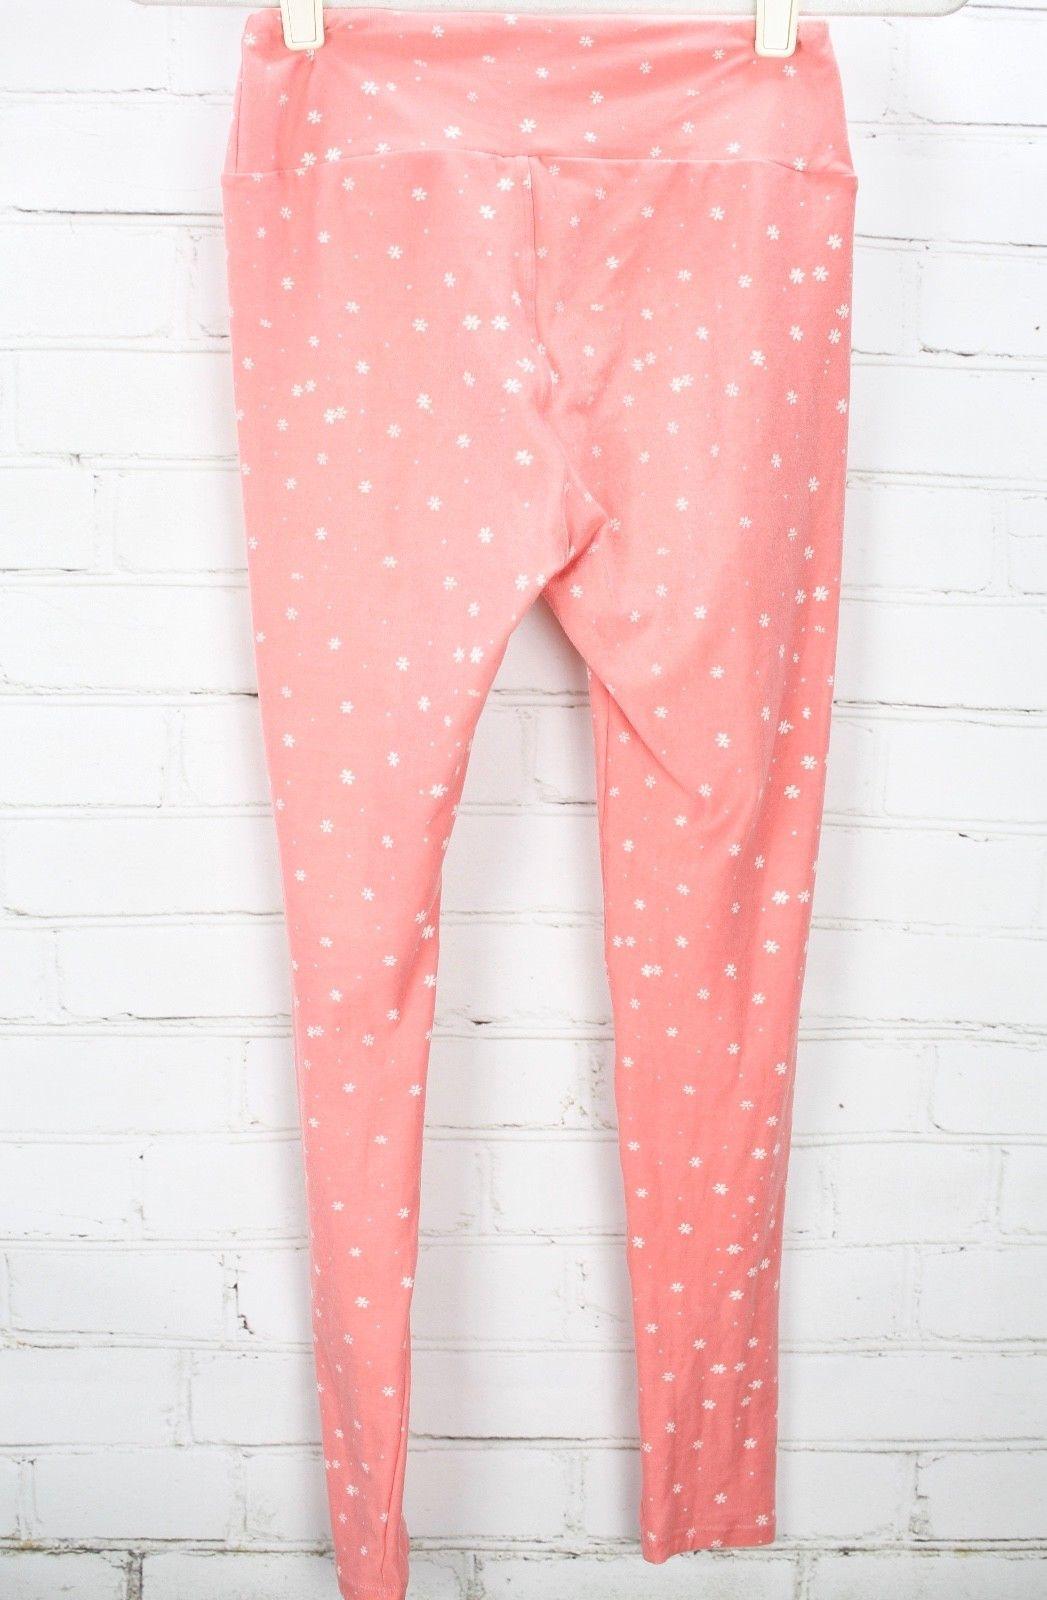 LULAROE Leggings Pink Floral Print OS One Size - Lot of 2 image 9